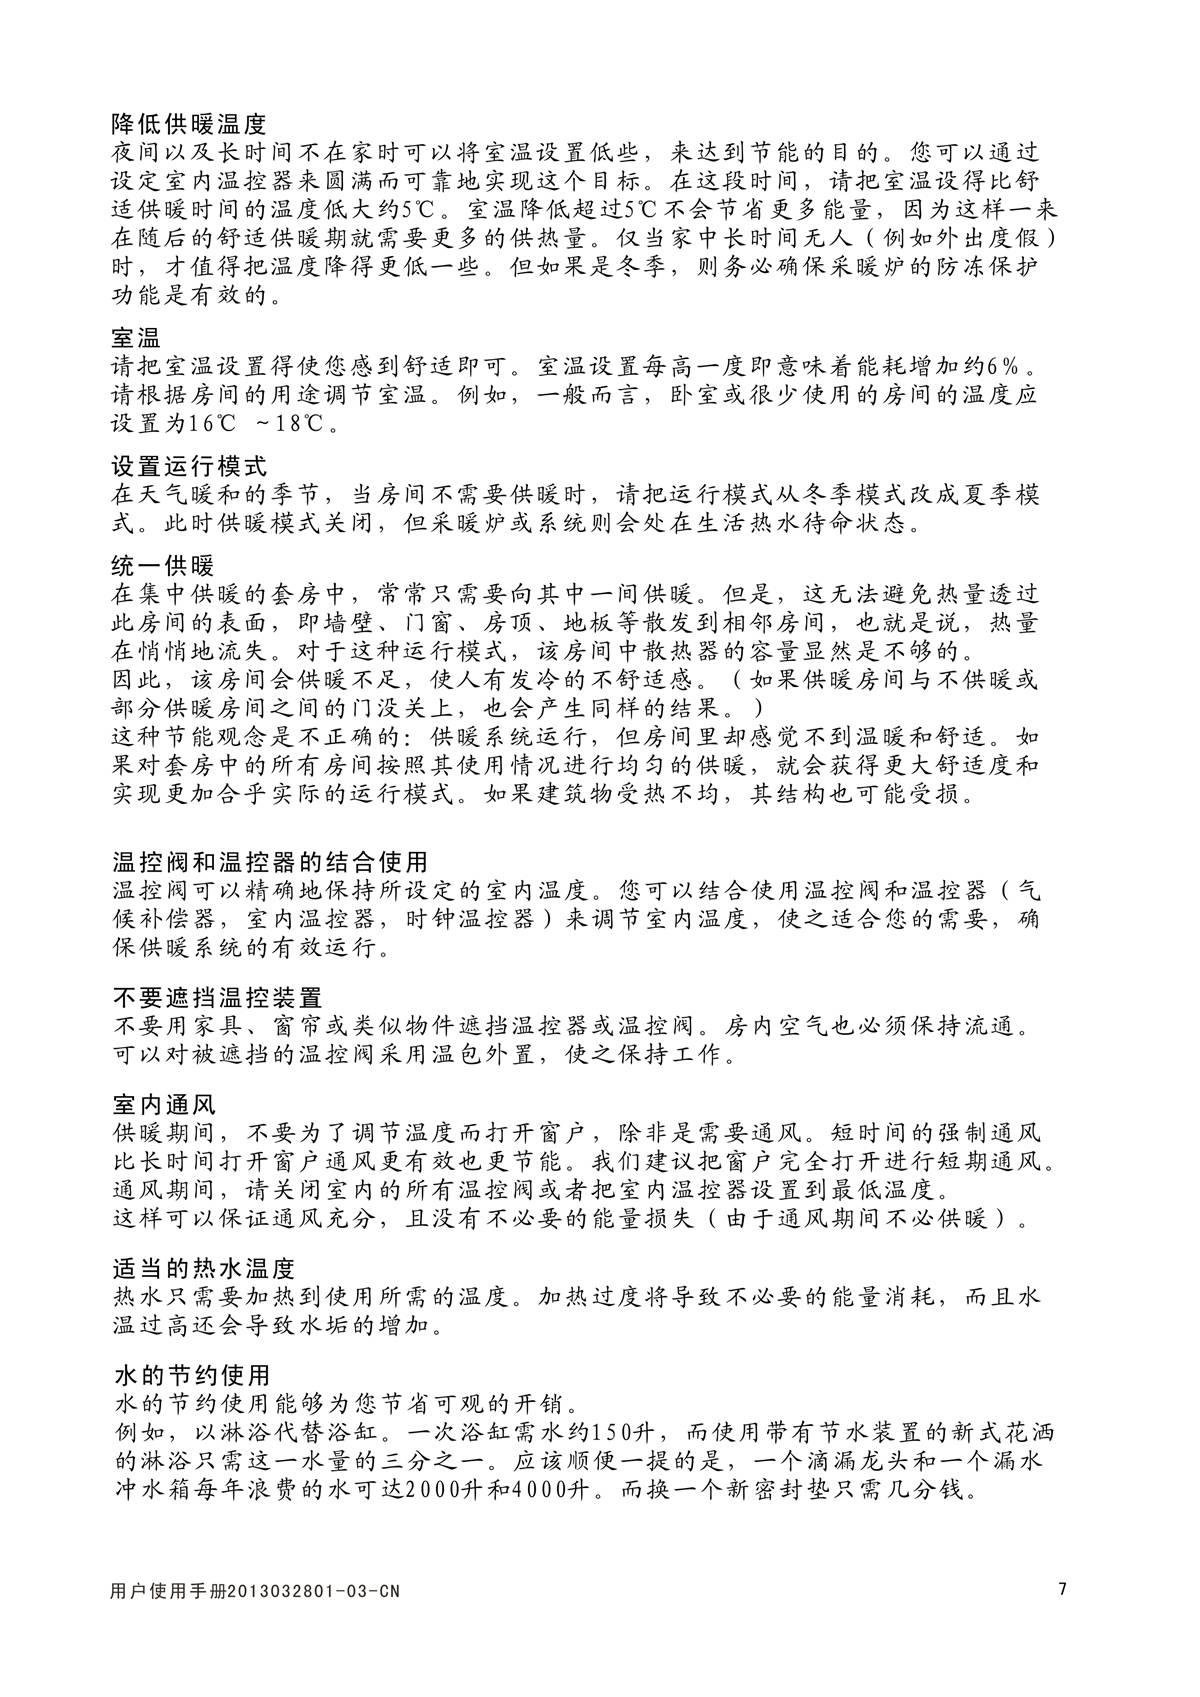 ES02系列-用户使用手册-8_02.jpg